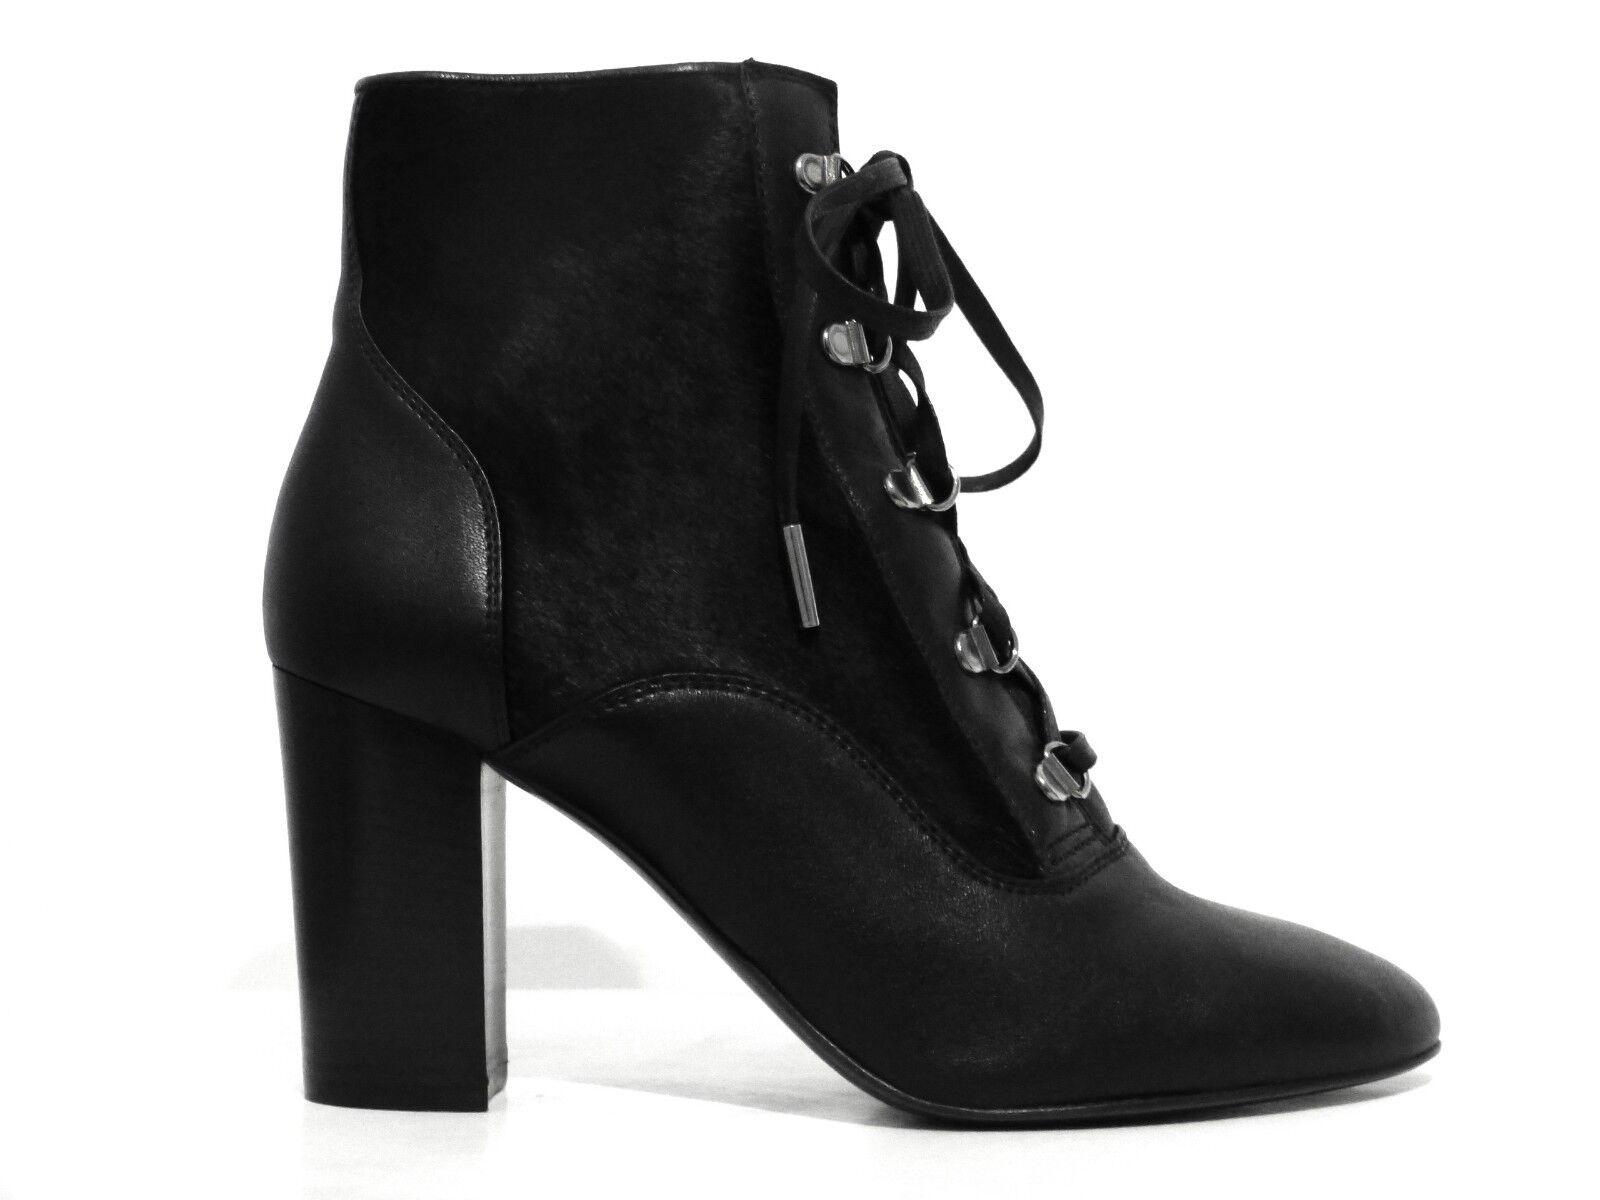 LANVIN Chaussures Bottines noir bottines bottes Calf real fur noir eu 39 Neuf New